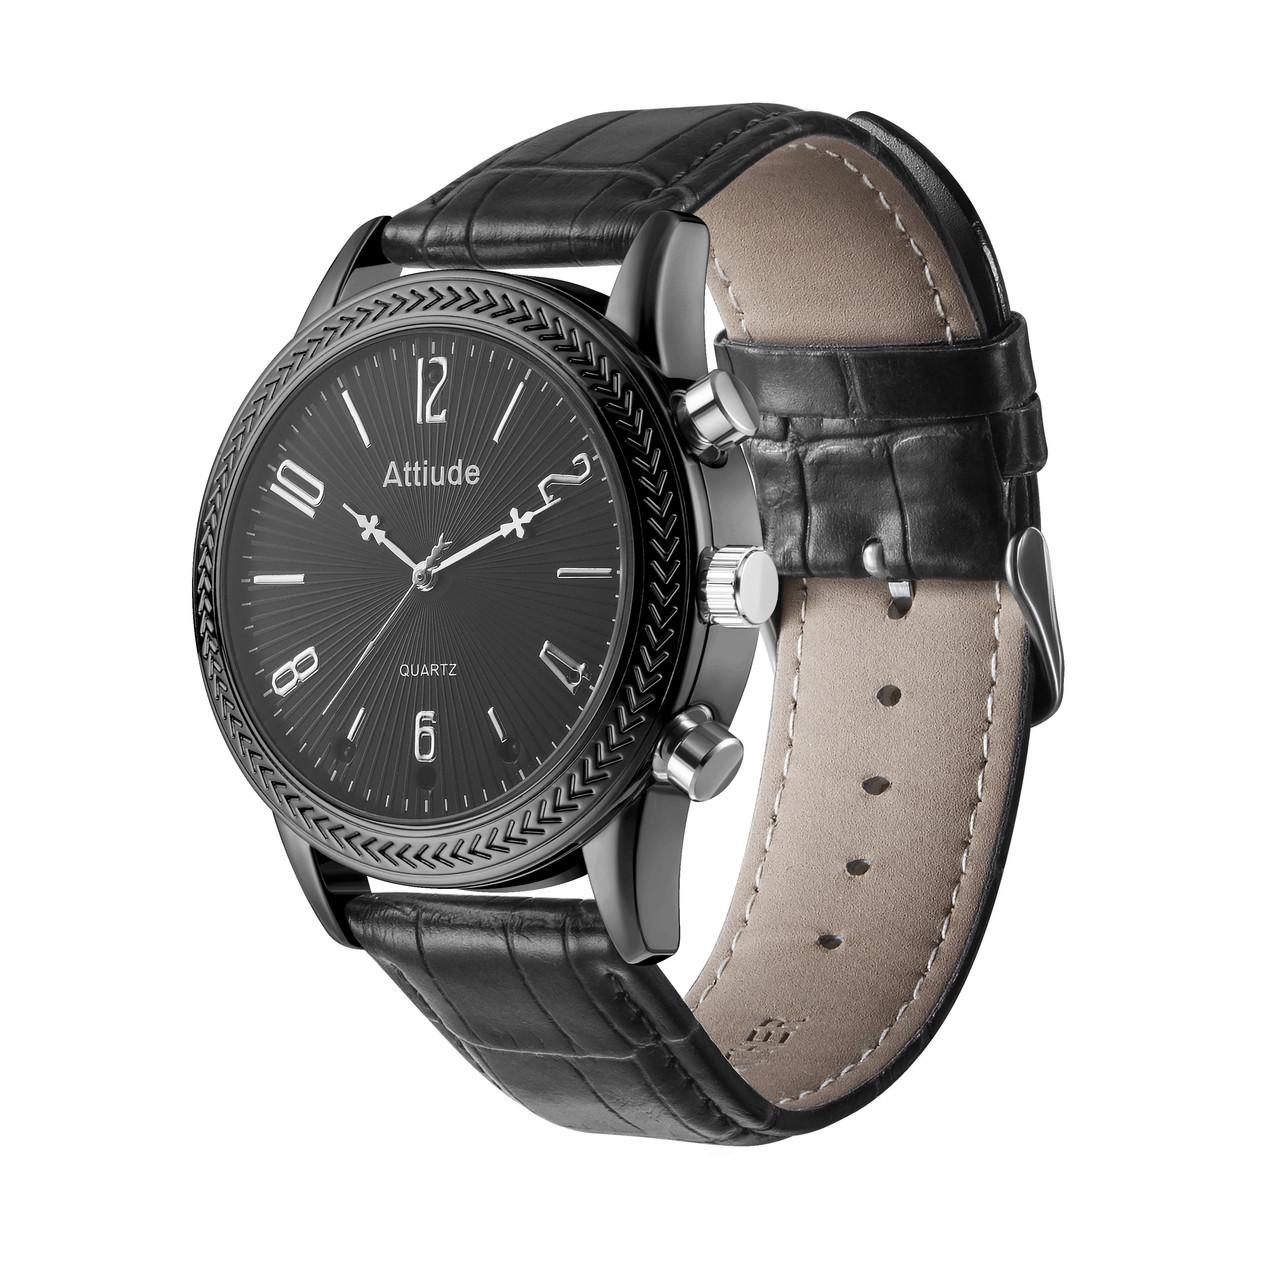 Wrist Watch Hidden Camera with Build-in DVR